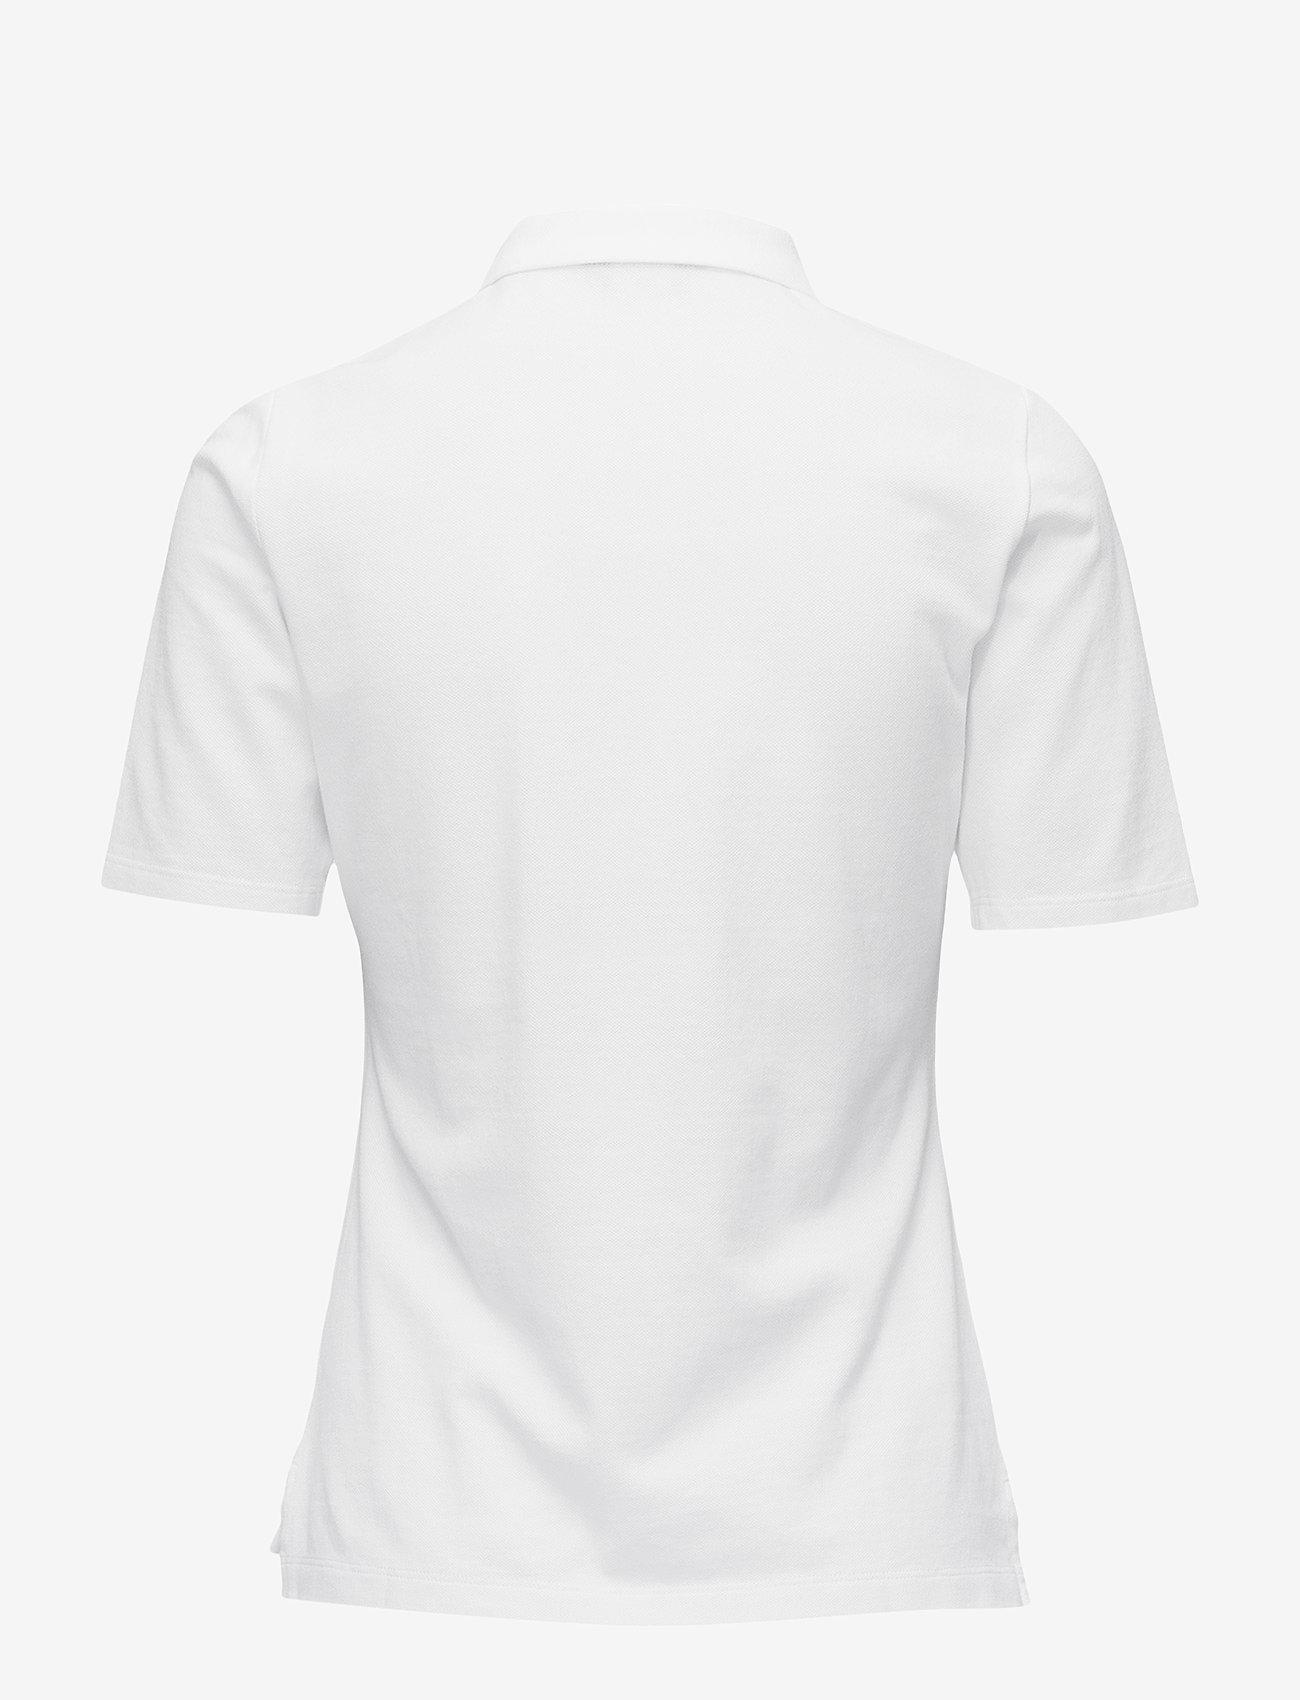 GANT - THE ORIGINAL PIQUE LSS - polo shirts - white - 1